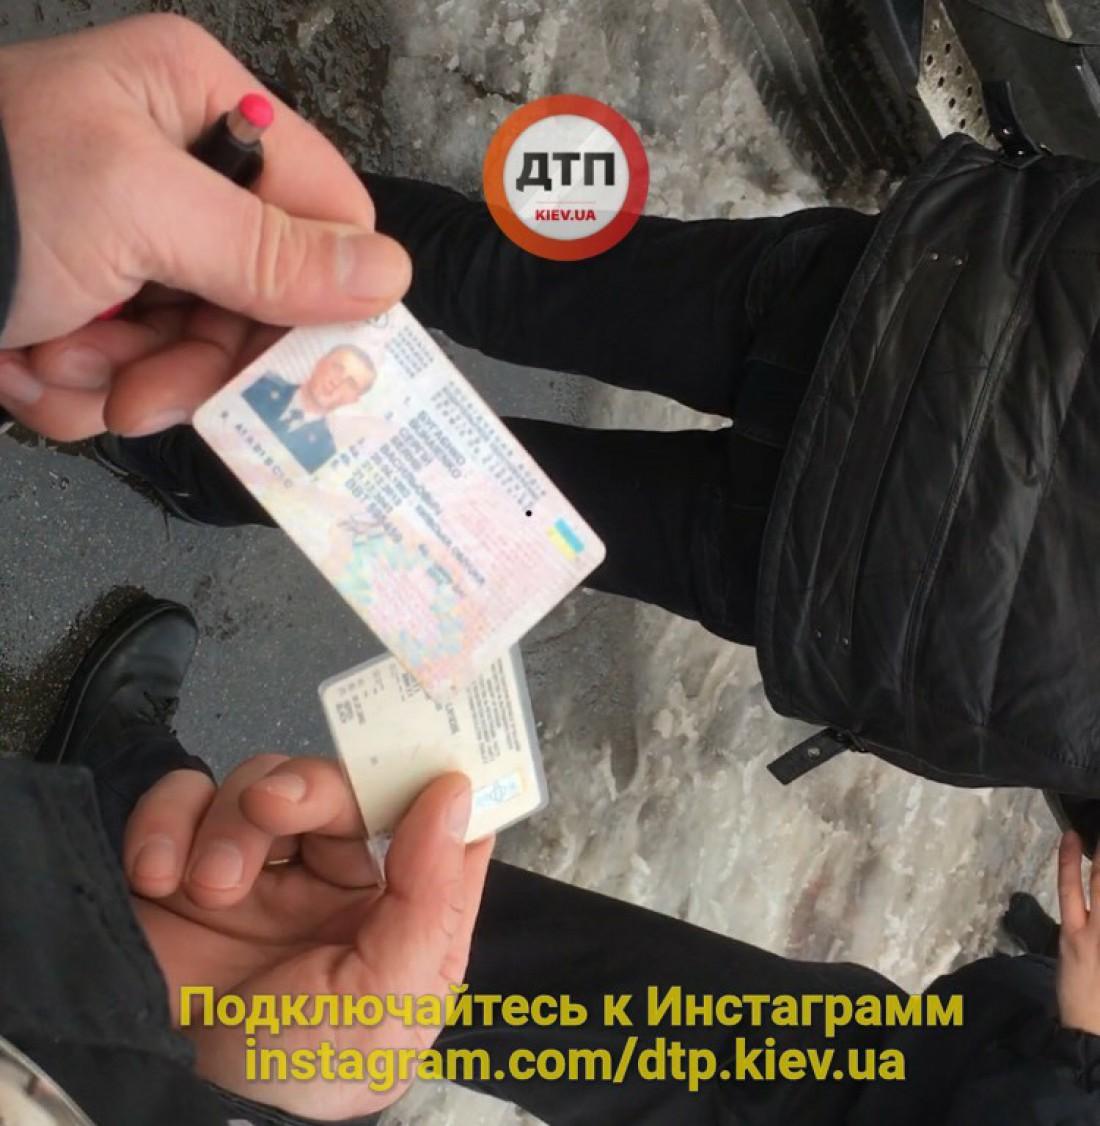 Изъяты права военкома Сергея Бугаенко